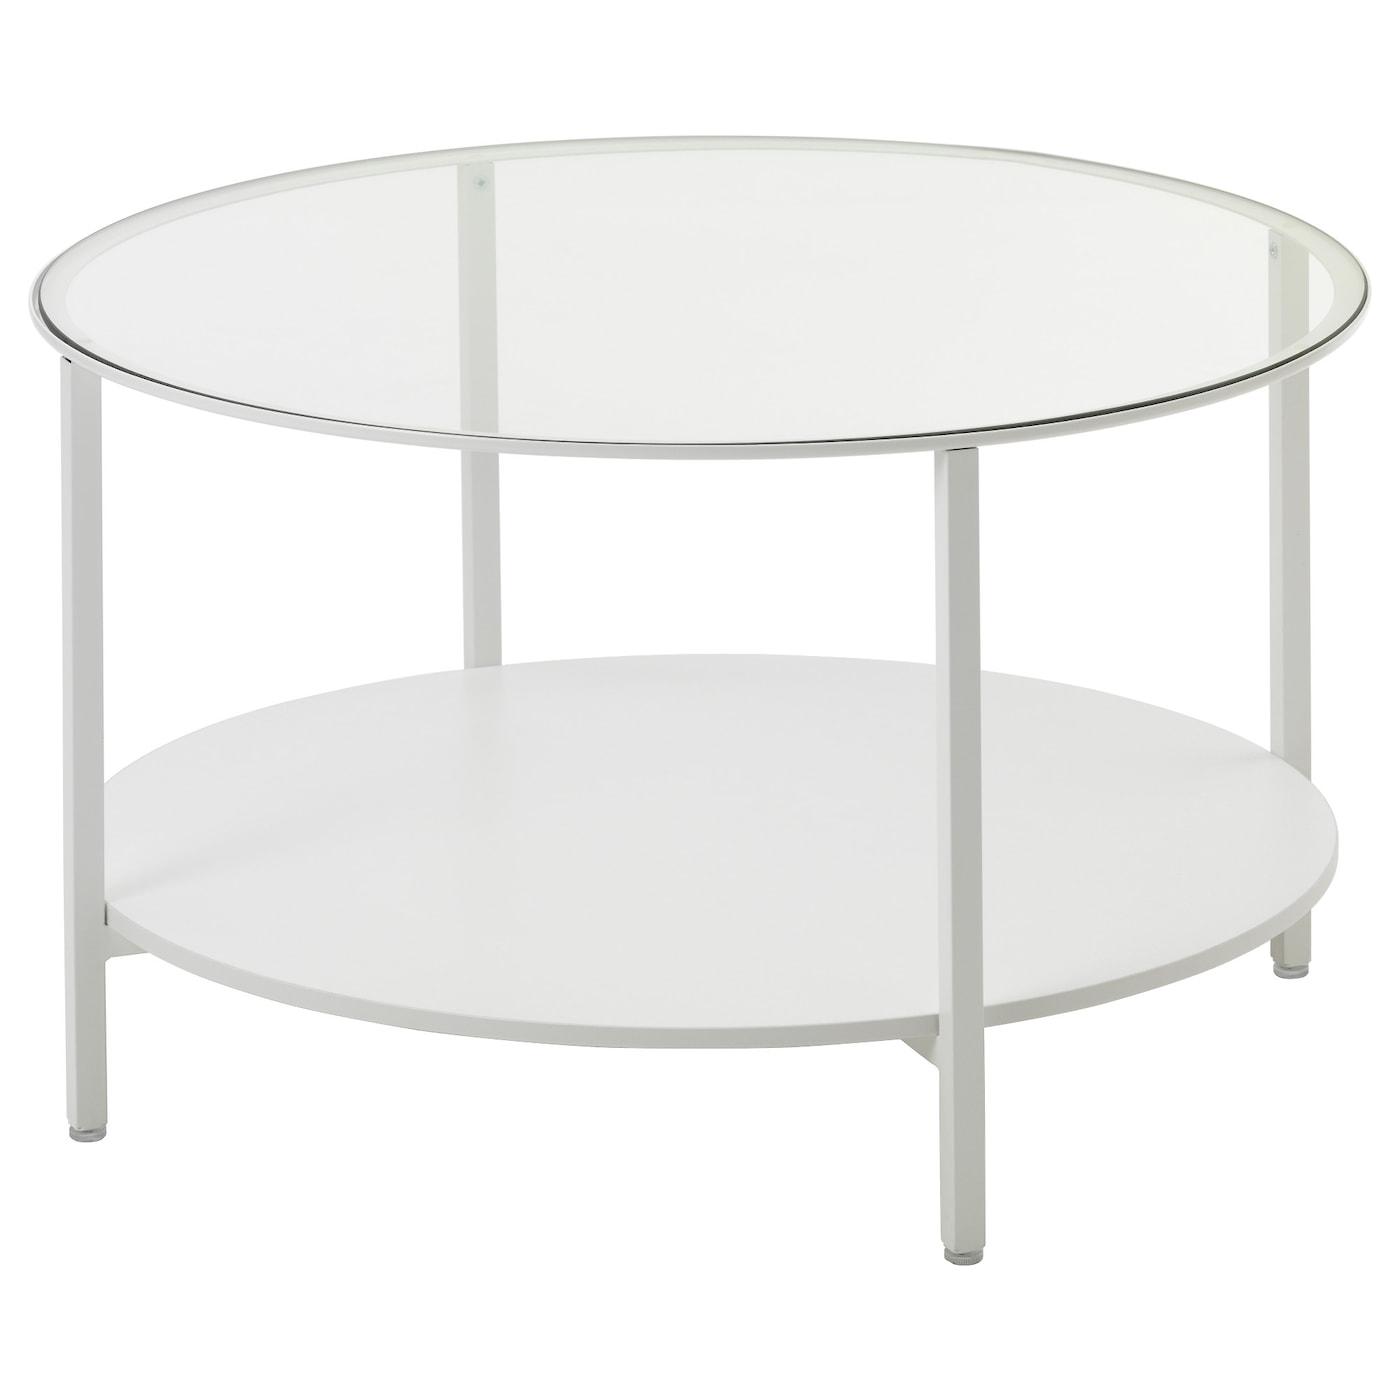 Vittsjo Coffee Table White Glass 75 Cm Ikea